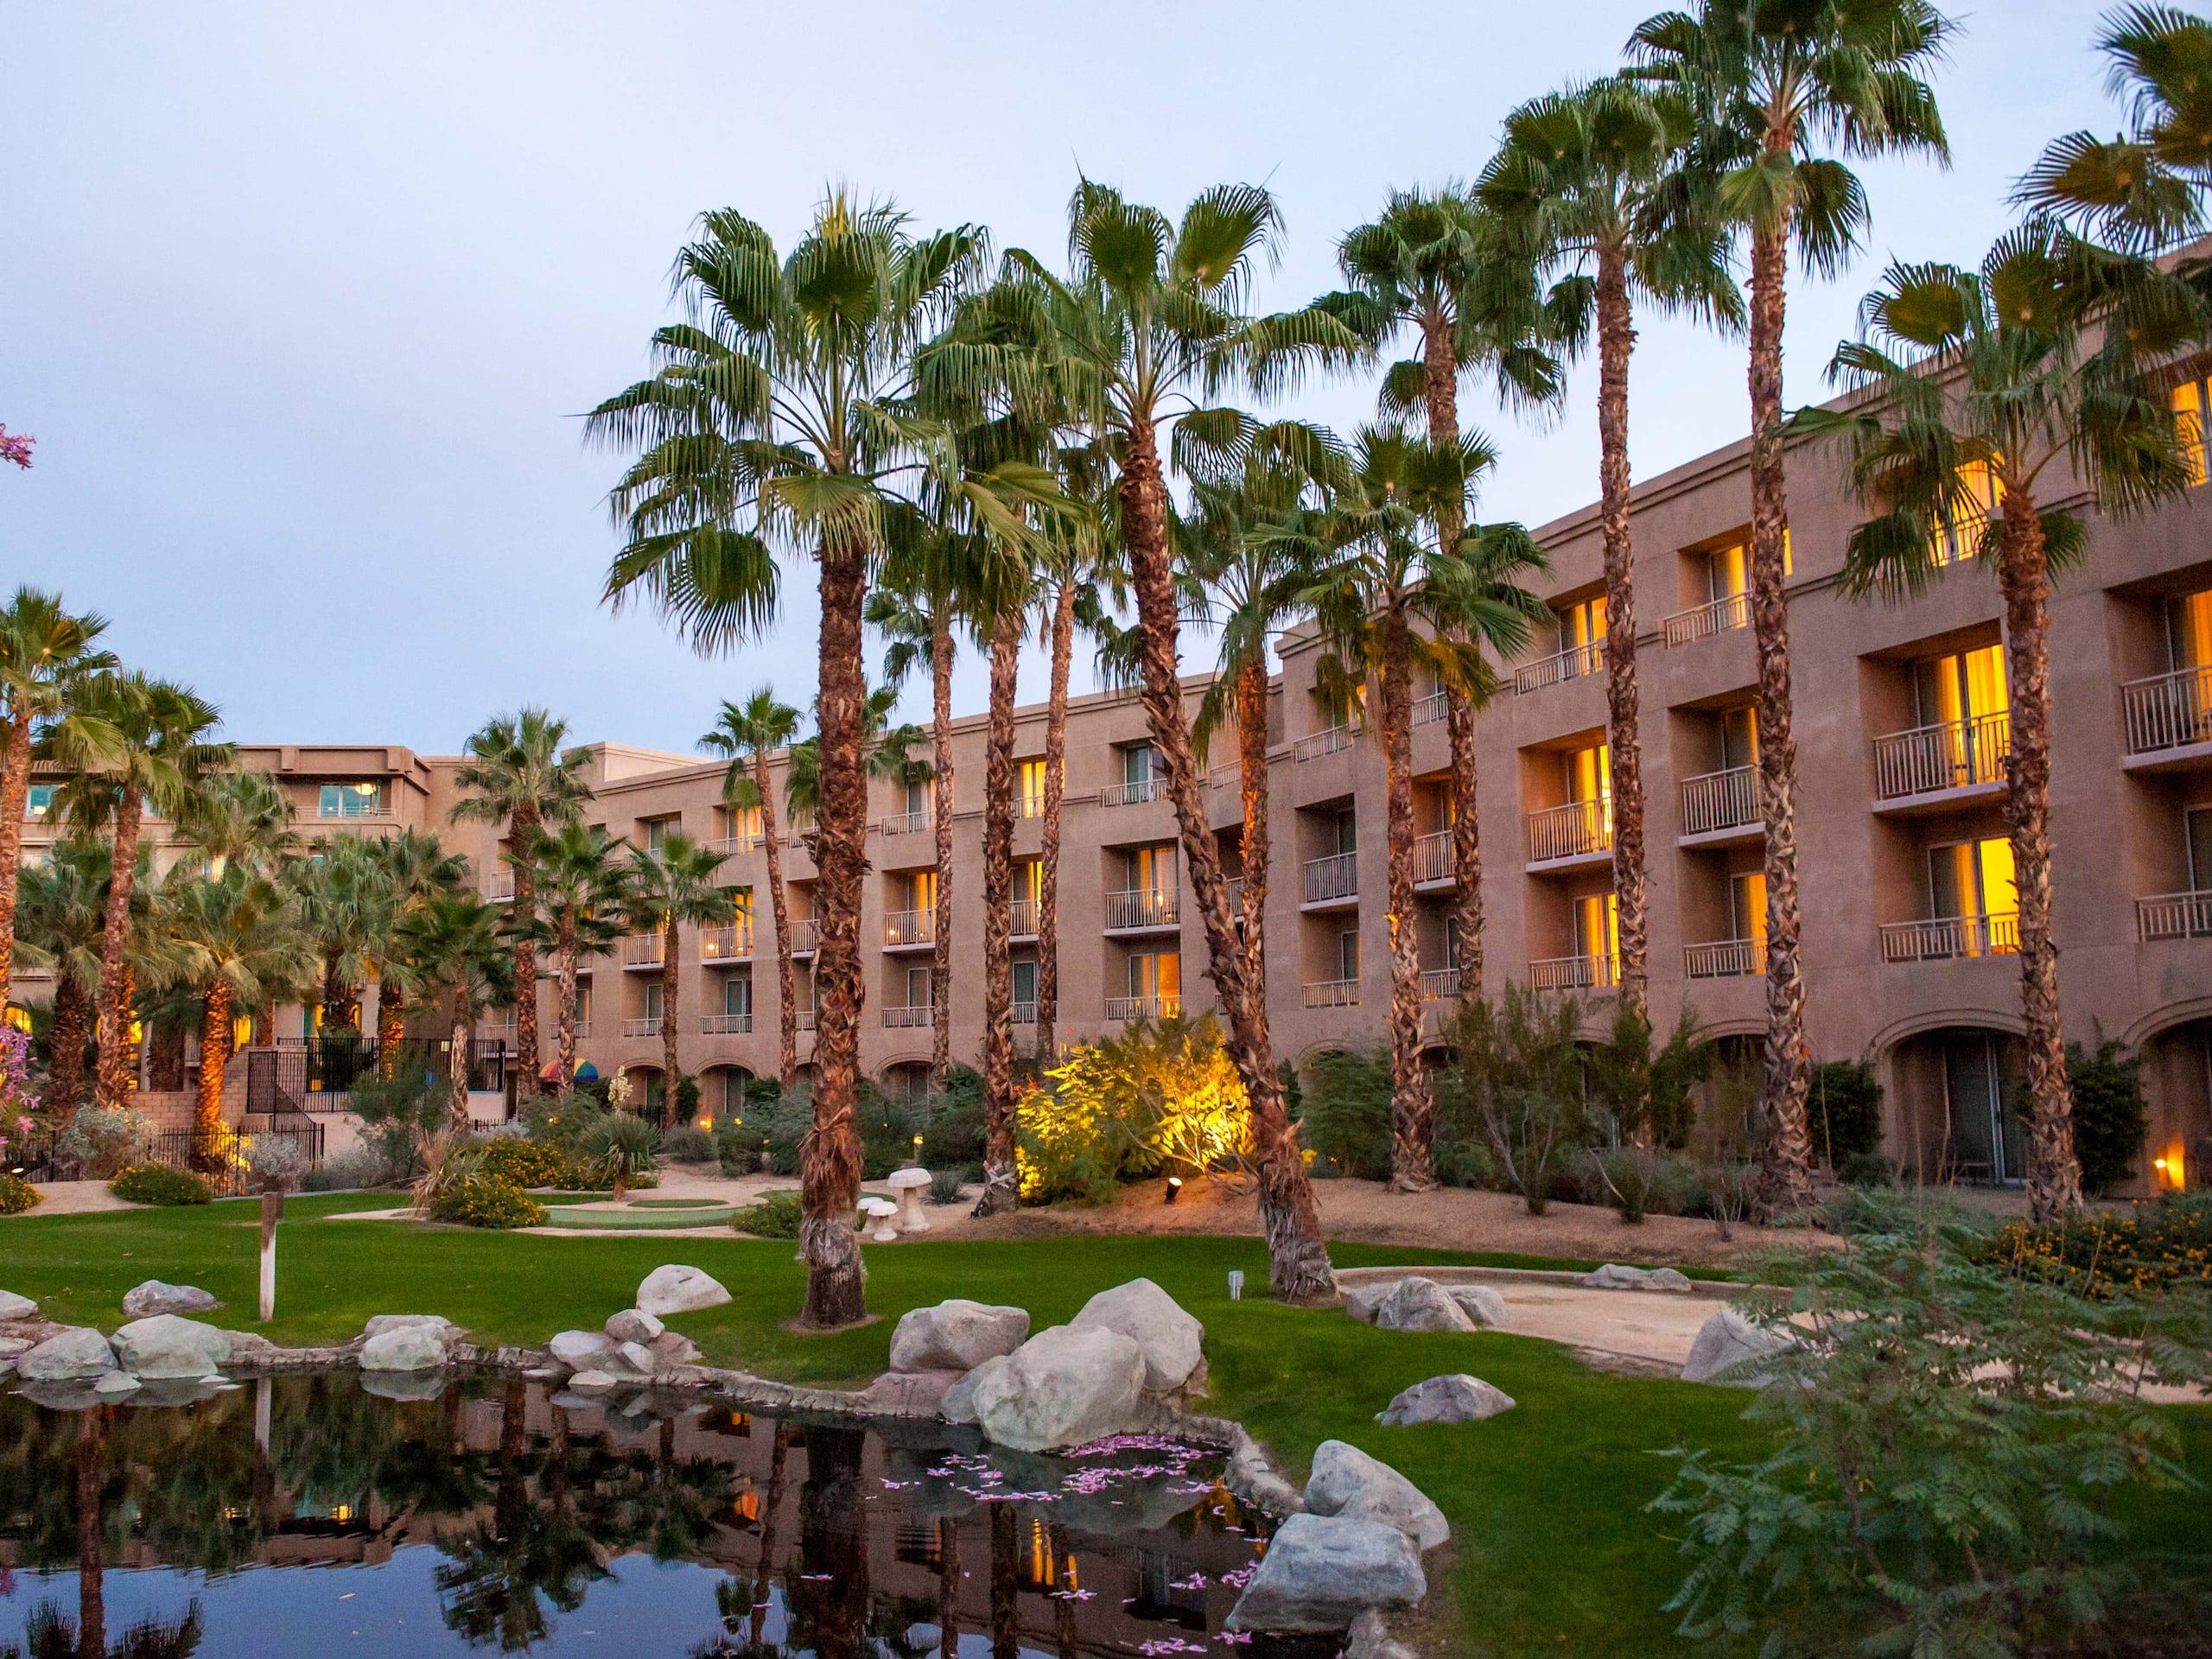 Resort Near Palm Springs | Hyatt Regency Indian Wells Resort & Spa